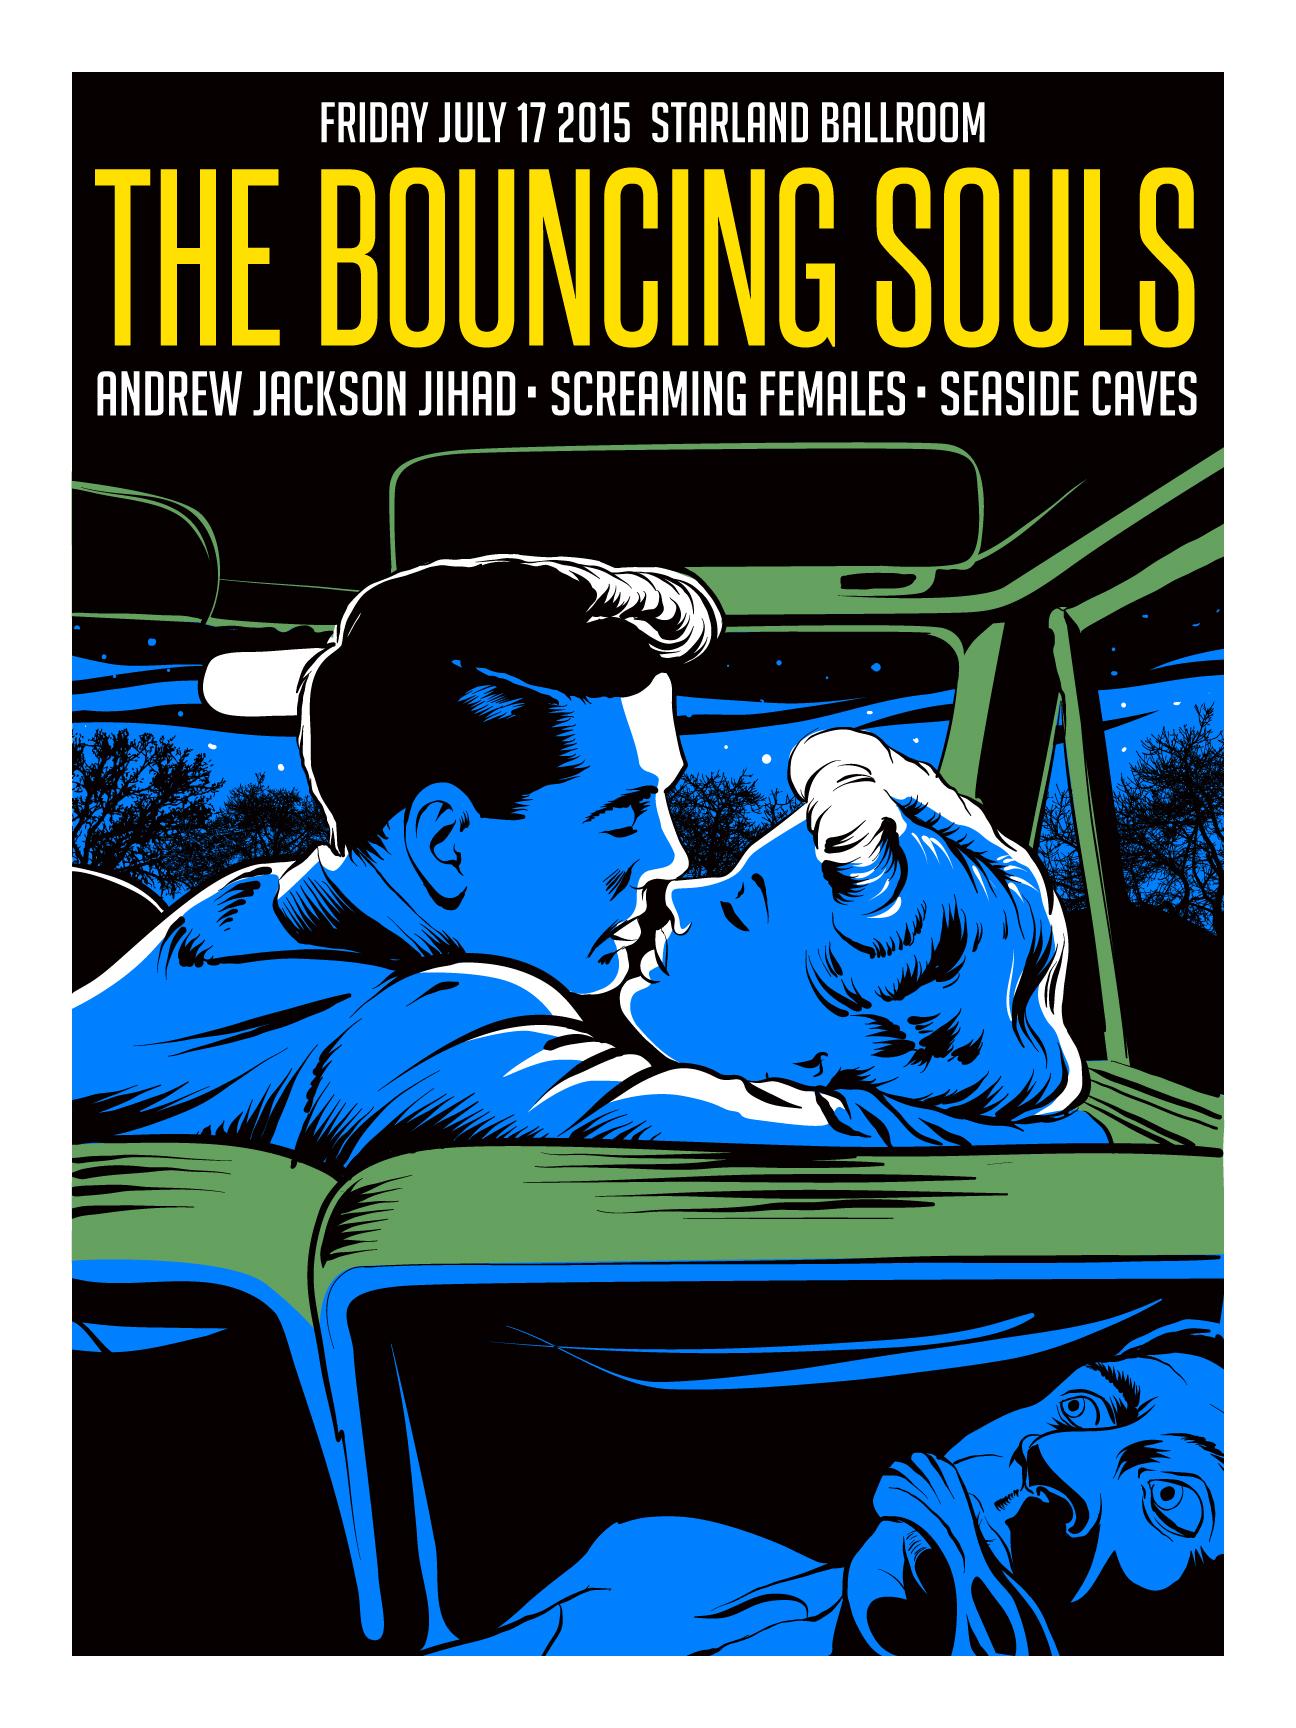 Bouncing Souls - 7/17/15